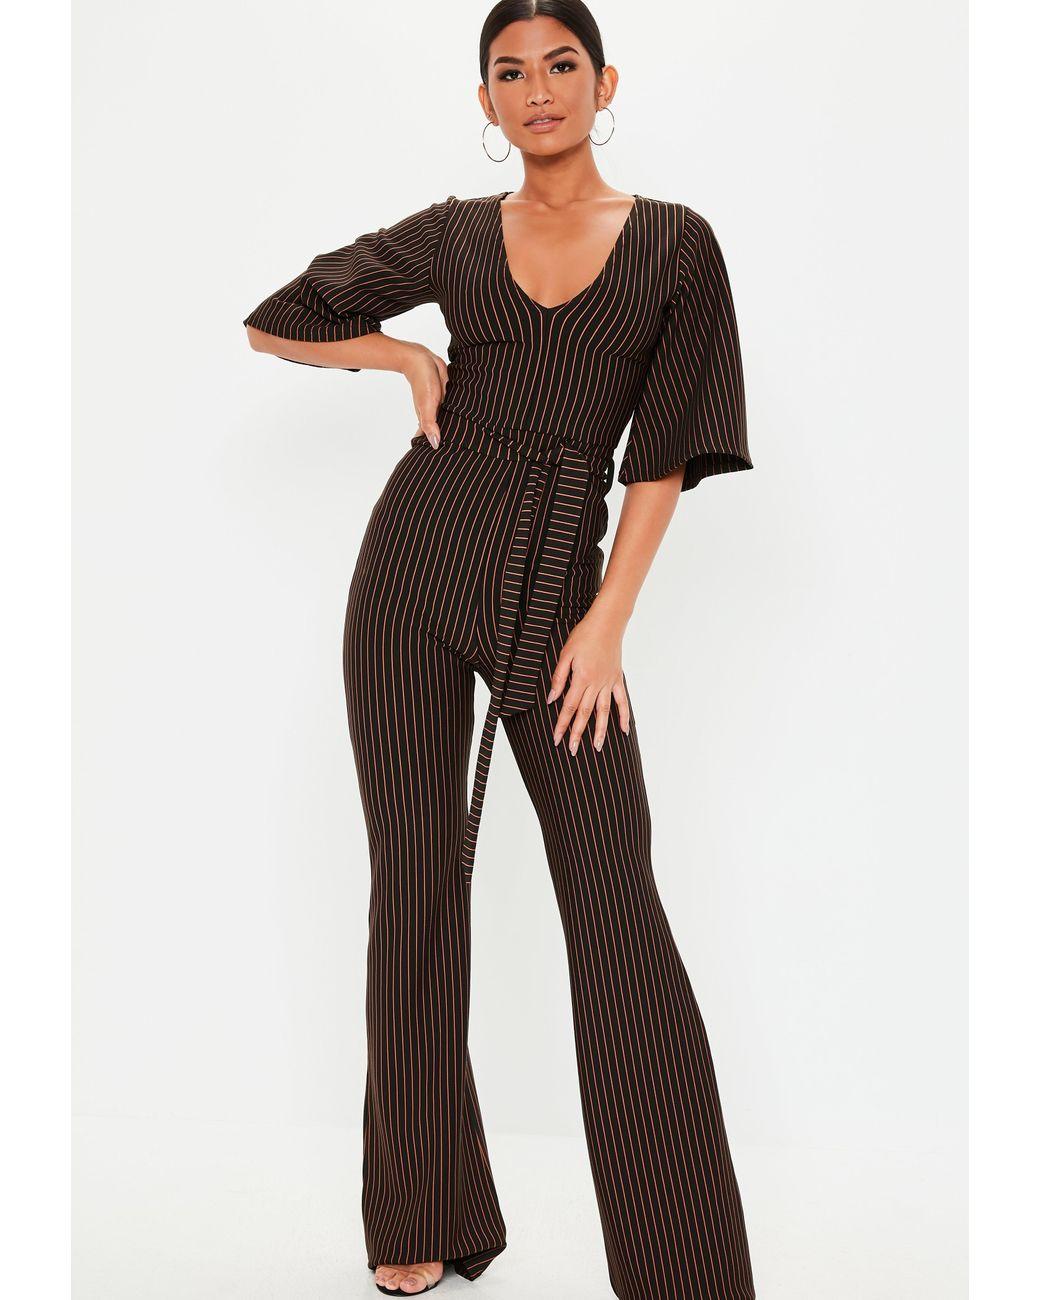 Women Mauve Black Calf Long Peg Leg Straight Pants Plunge Mesh Sleeve Jumpsuit